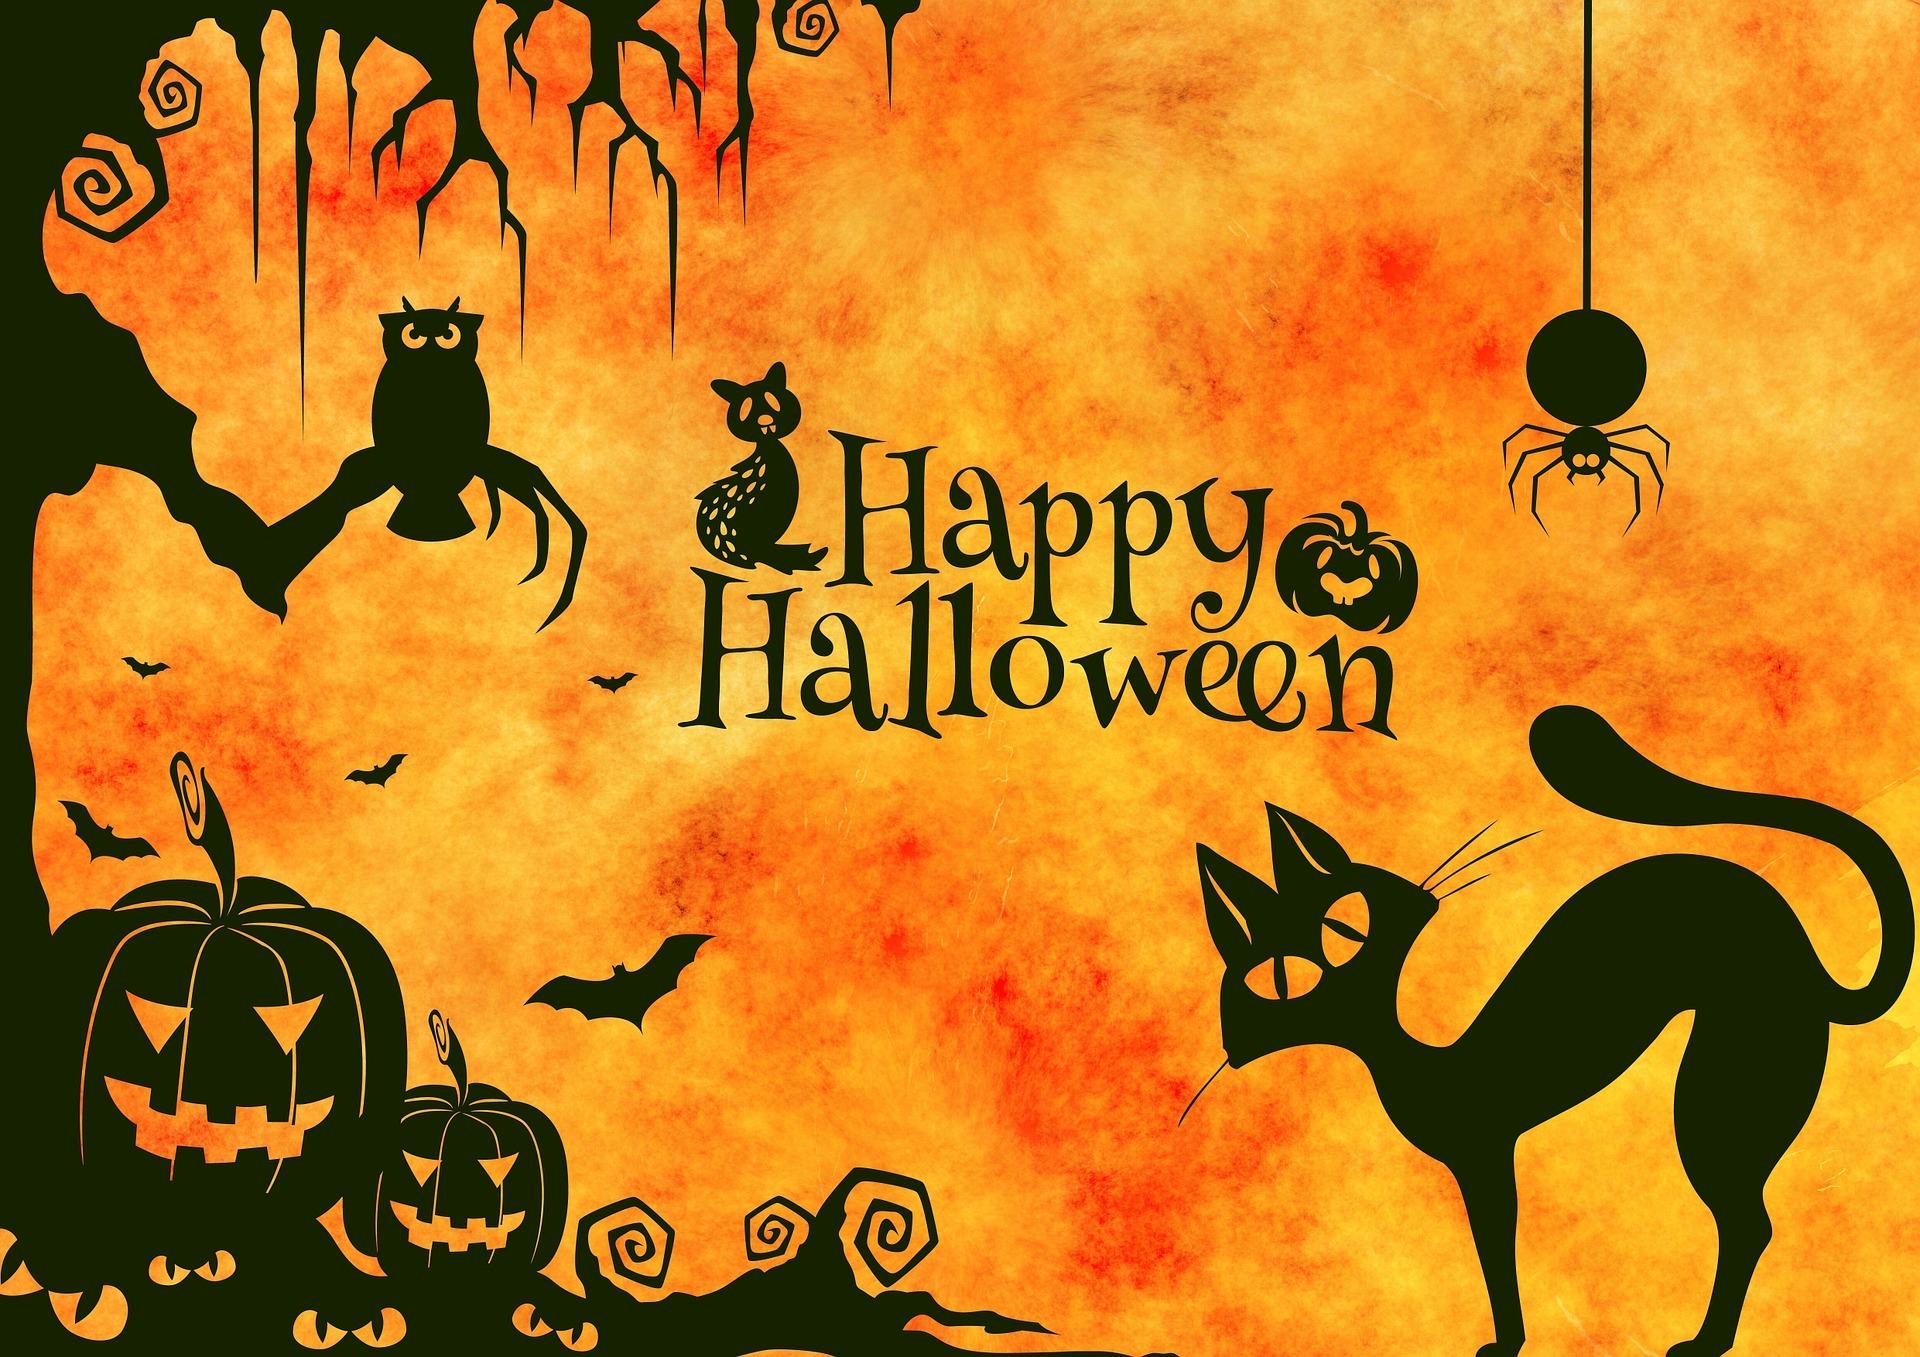 halloween-959006_1920.jpg